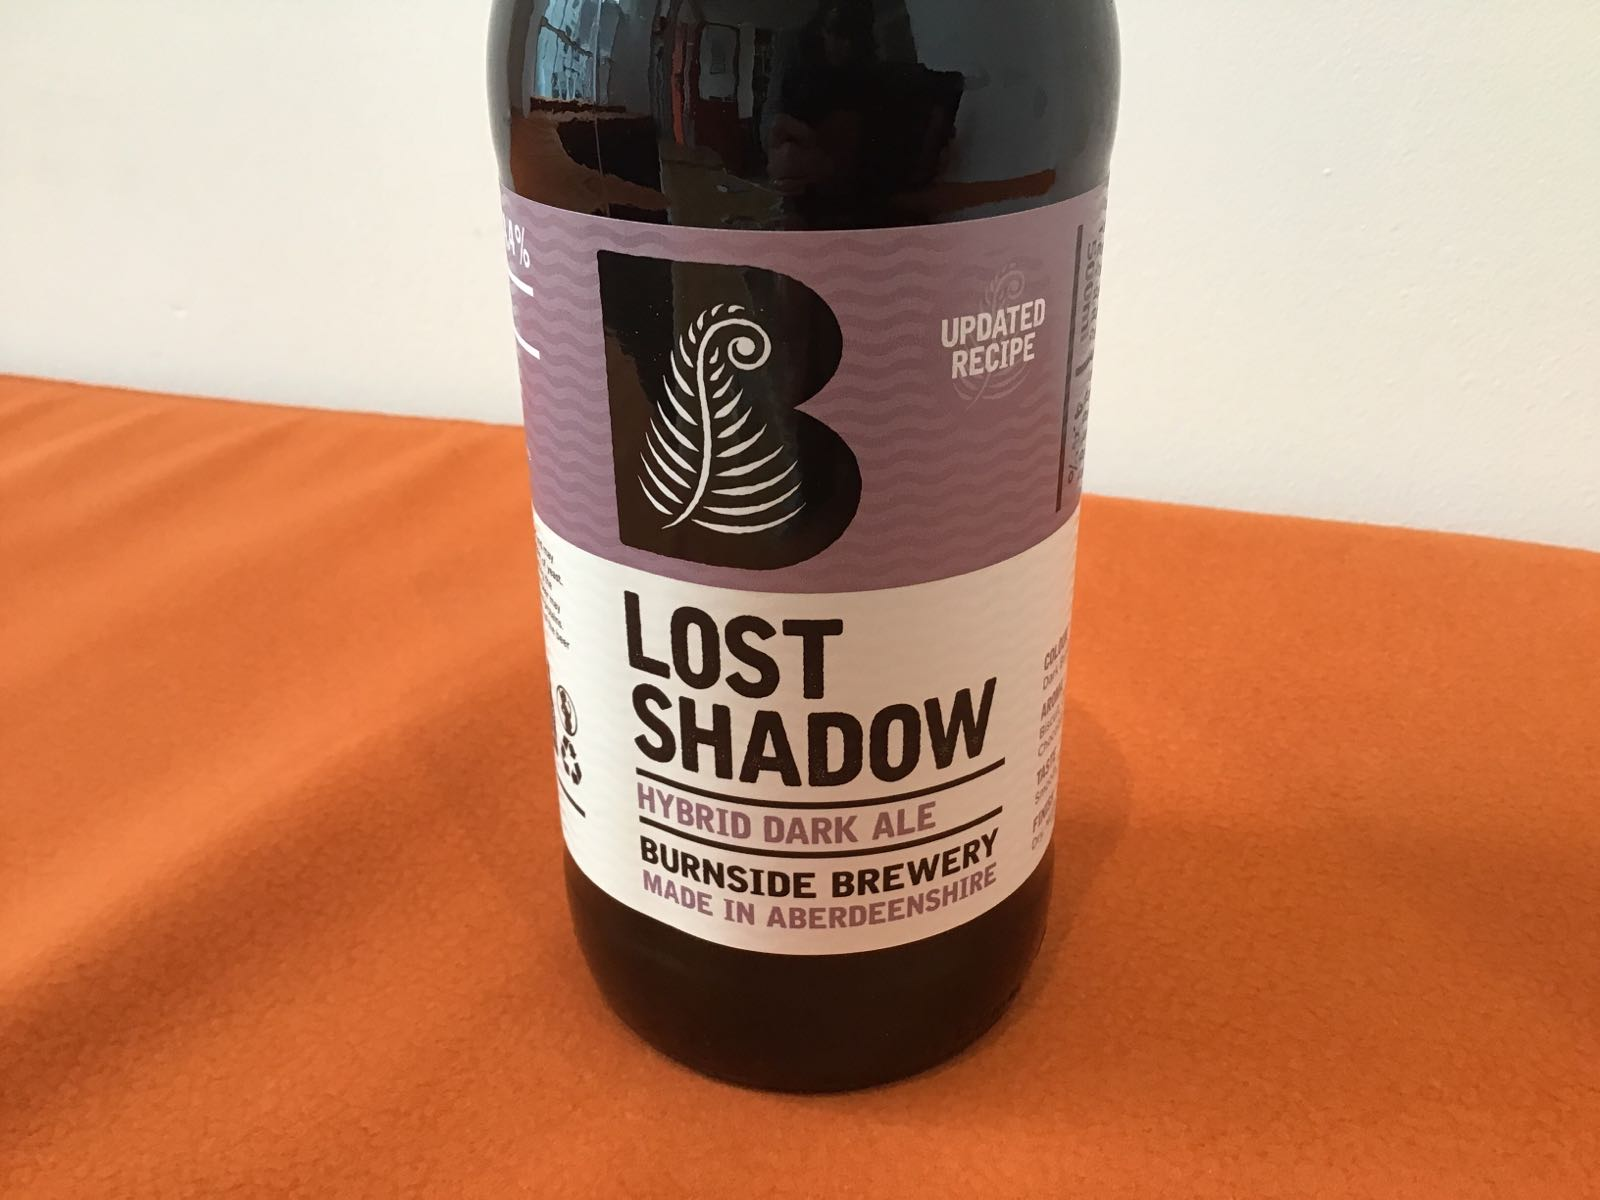 Burnside Brewery: Lost Shadow